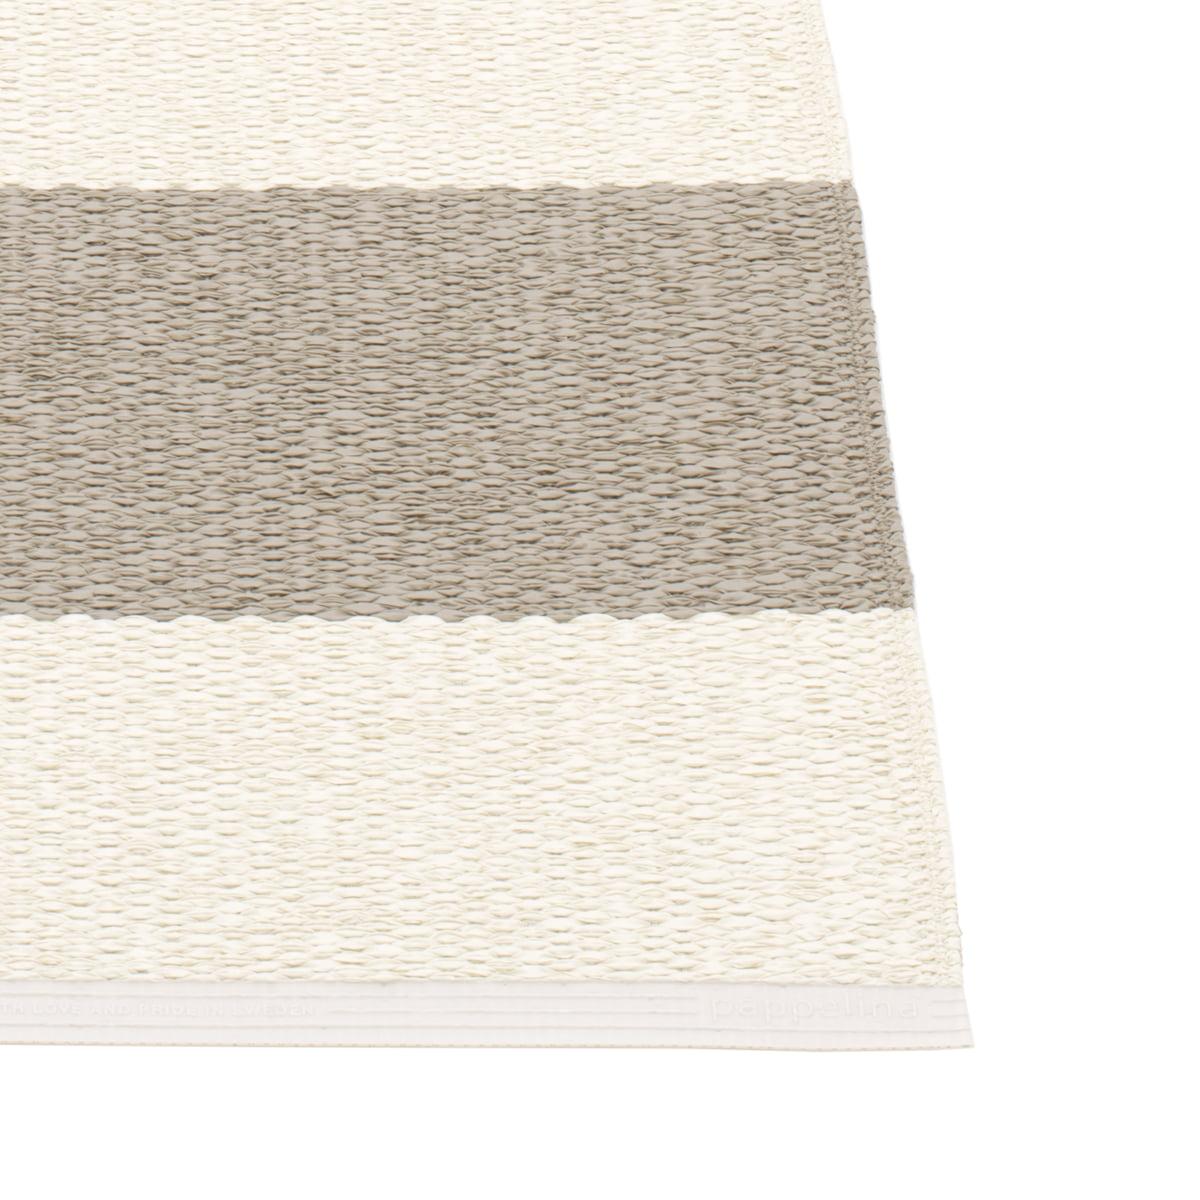 bob teppich 140 cm von pappelina connox. Black Bedroom Furniture Sets. Home Design Ideas